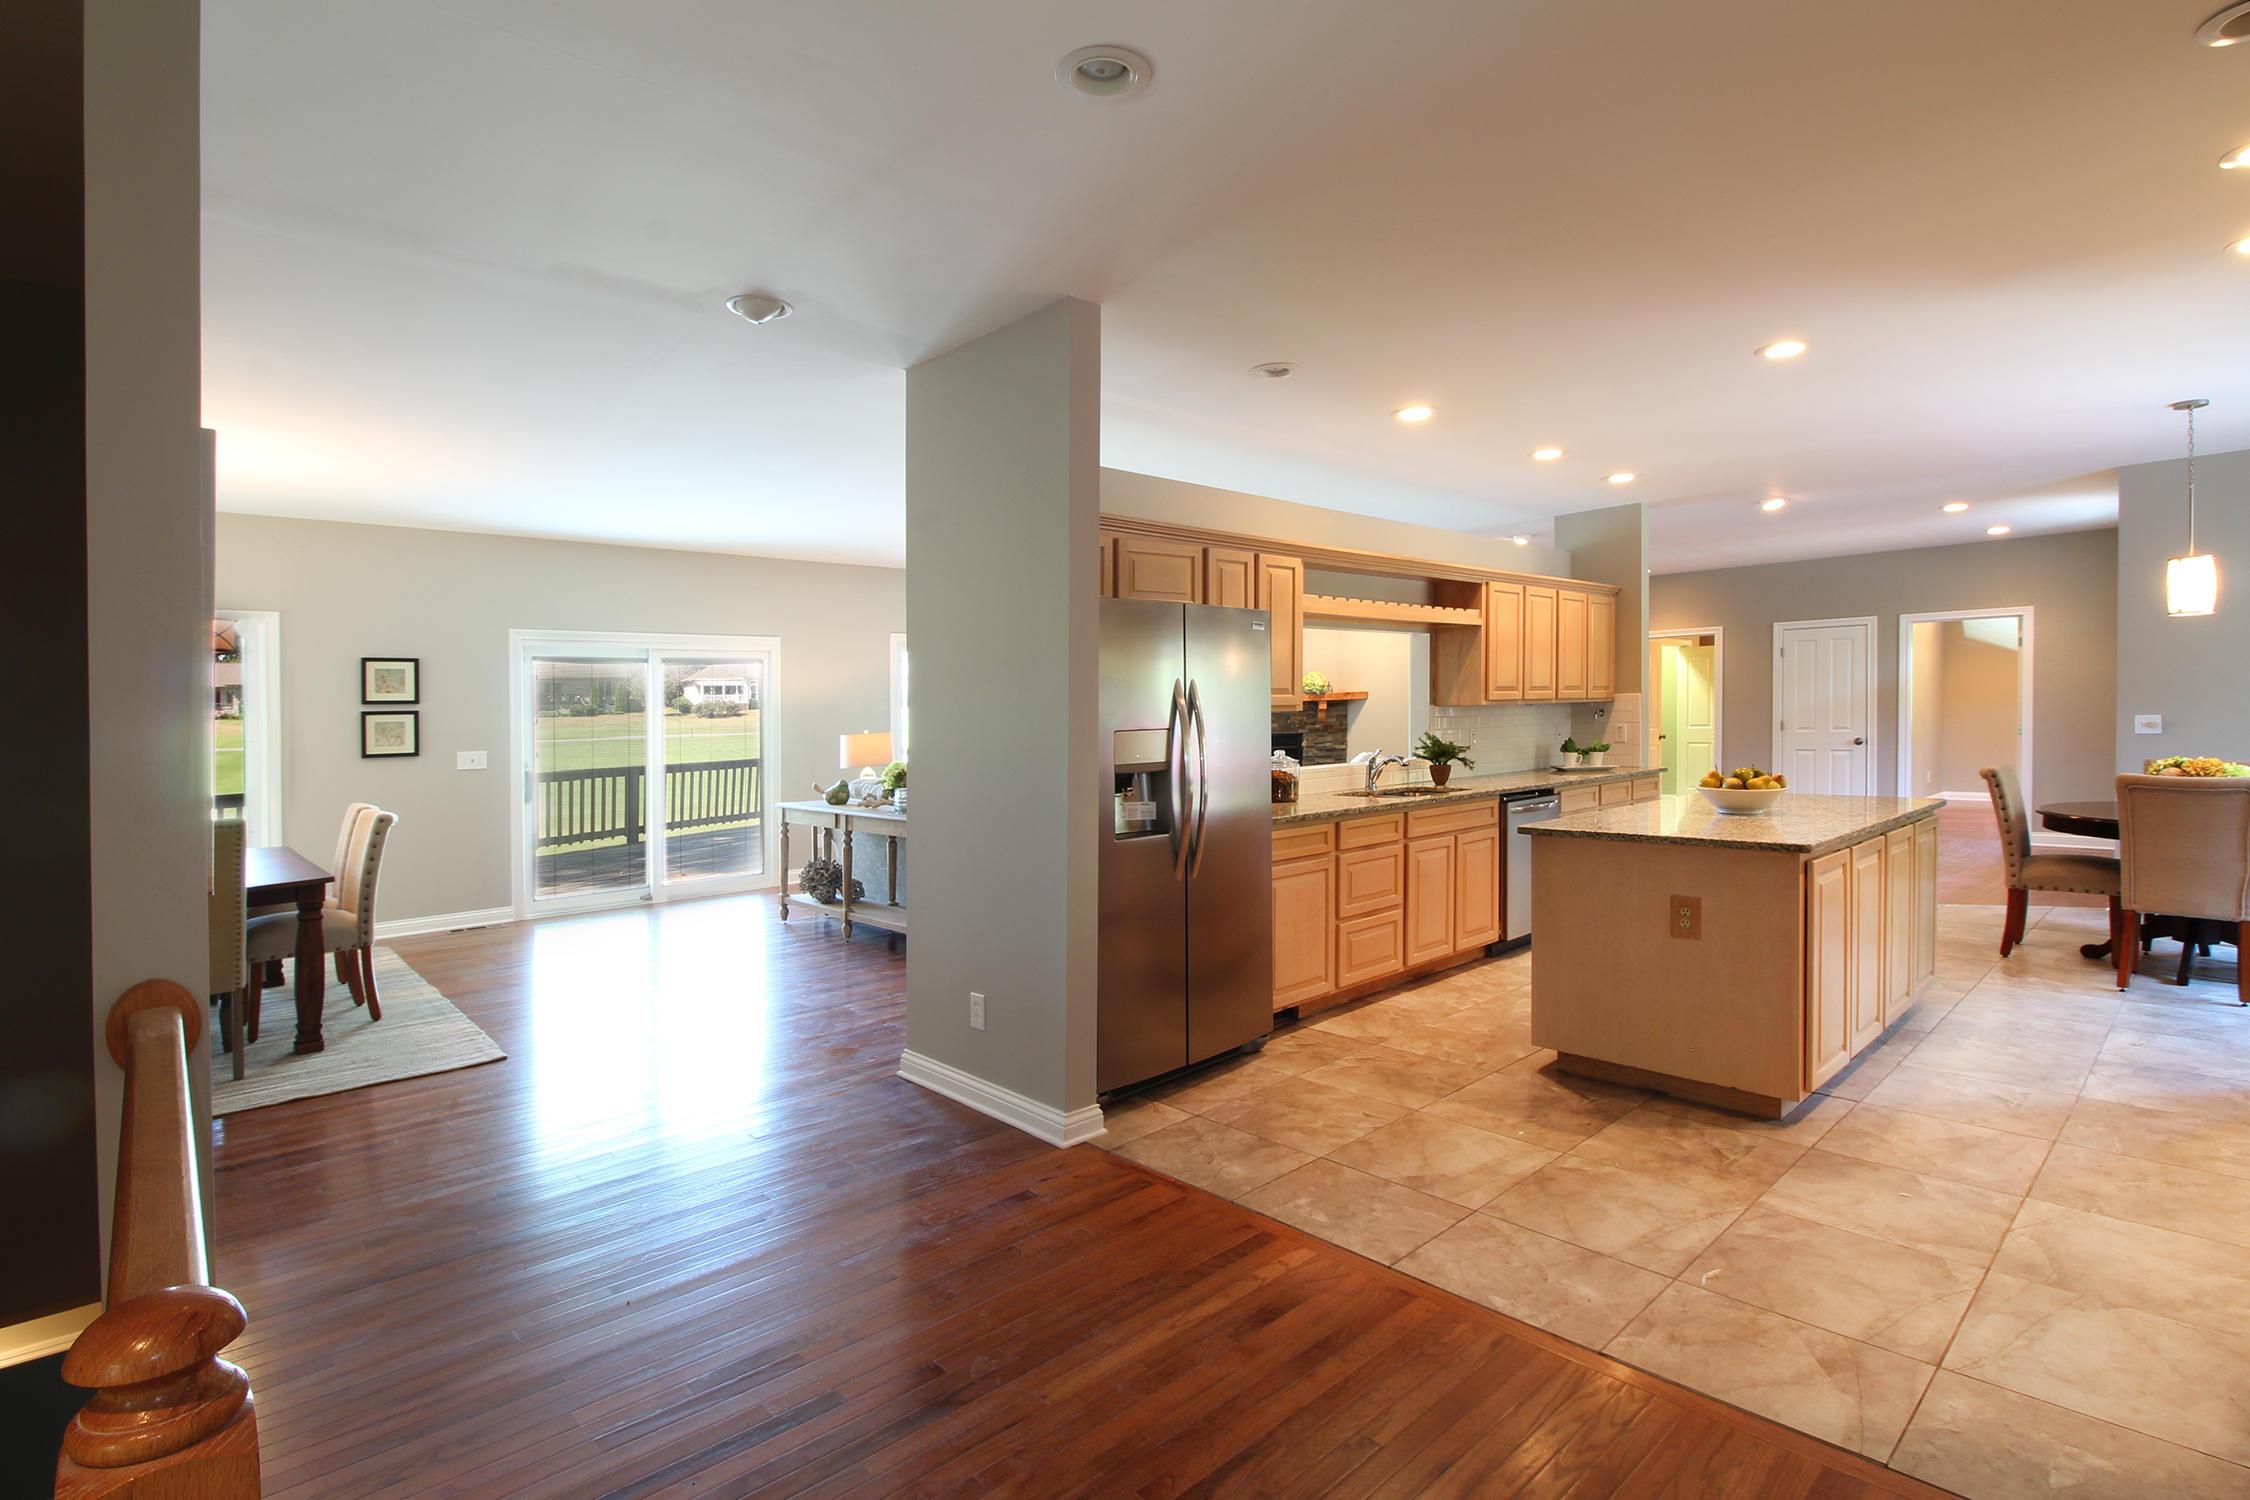 302 Tigitsi Way, Loudon, Tennessee 37774, 3 Bedrooms Bedrooms, ,3 BathroomsBathrooms,Single Family,For Sale,Tigitsi,1095356